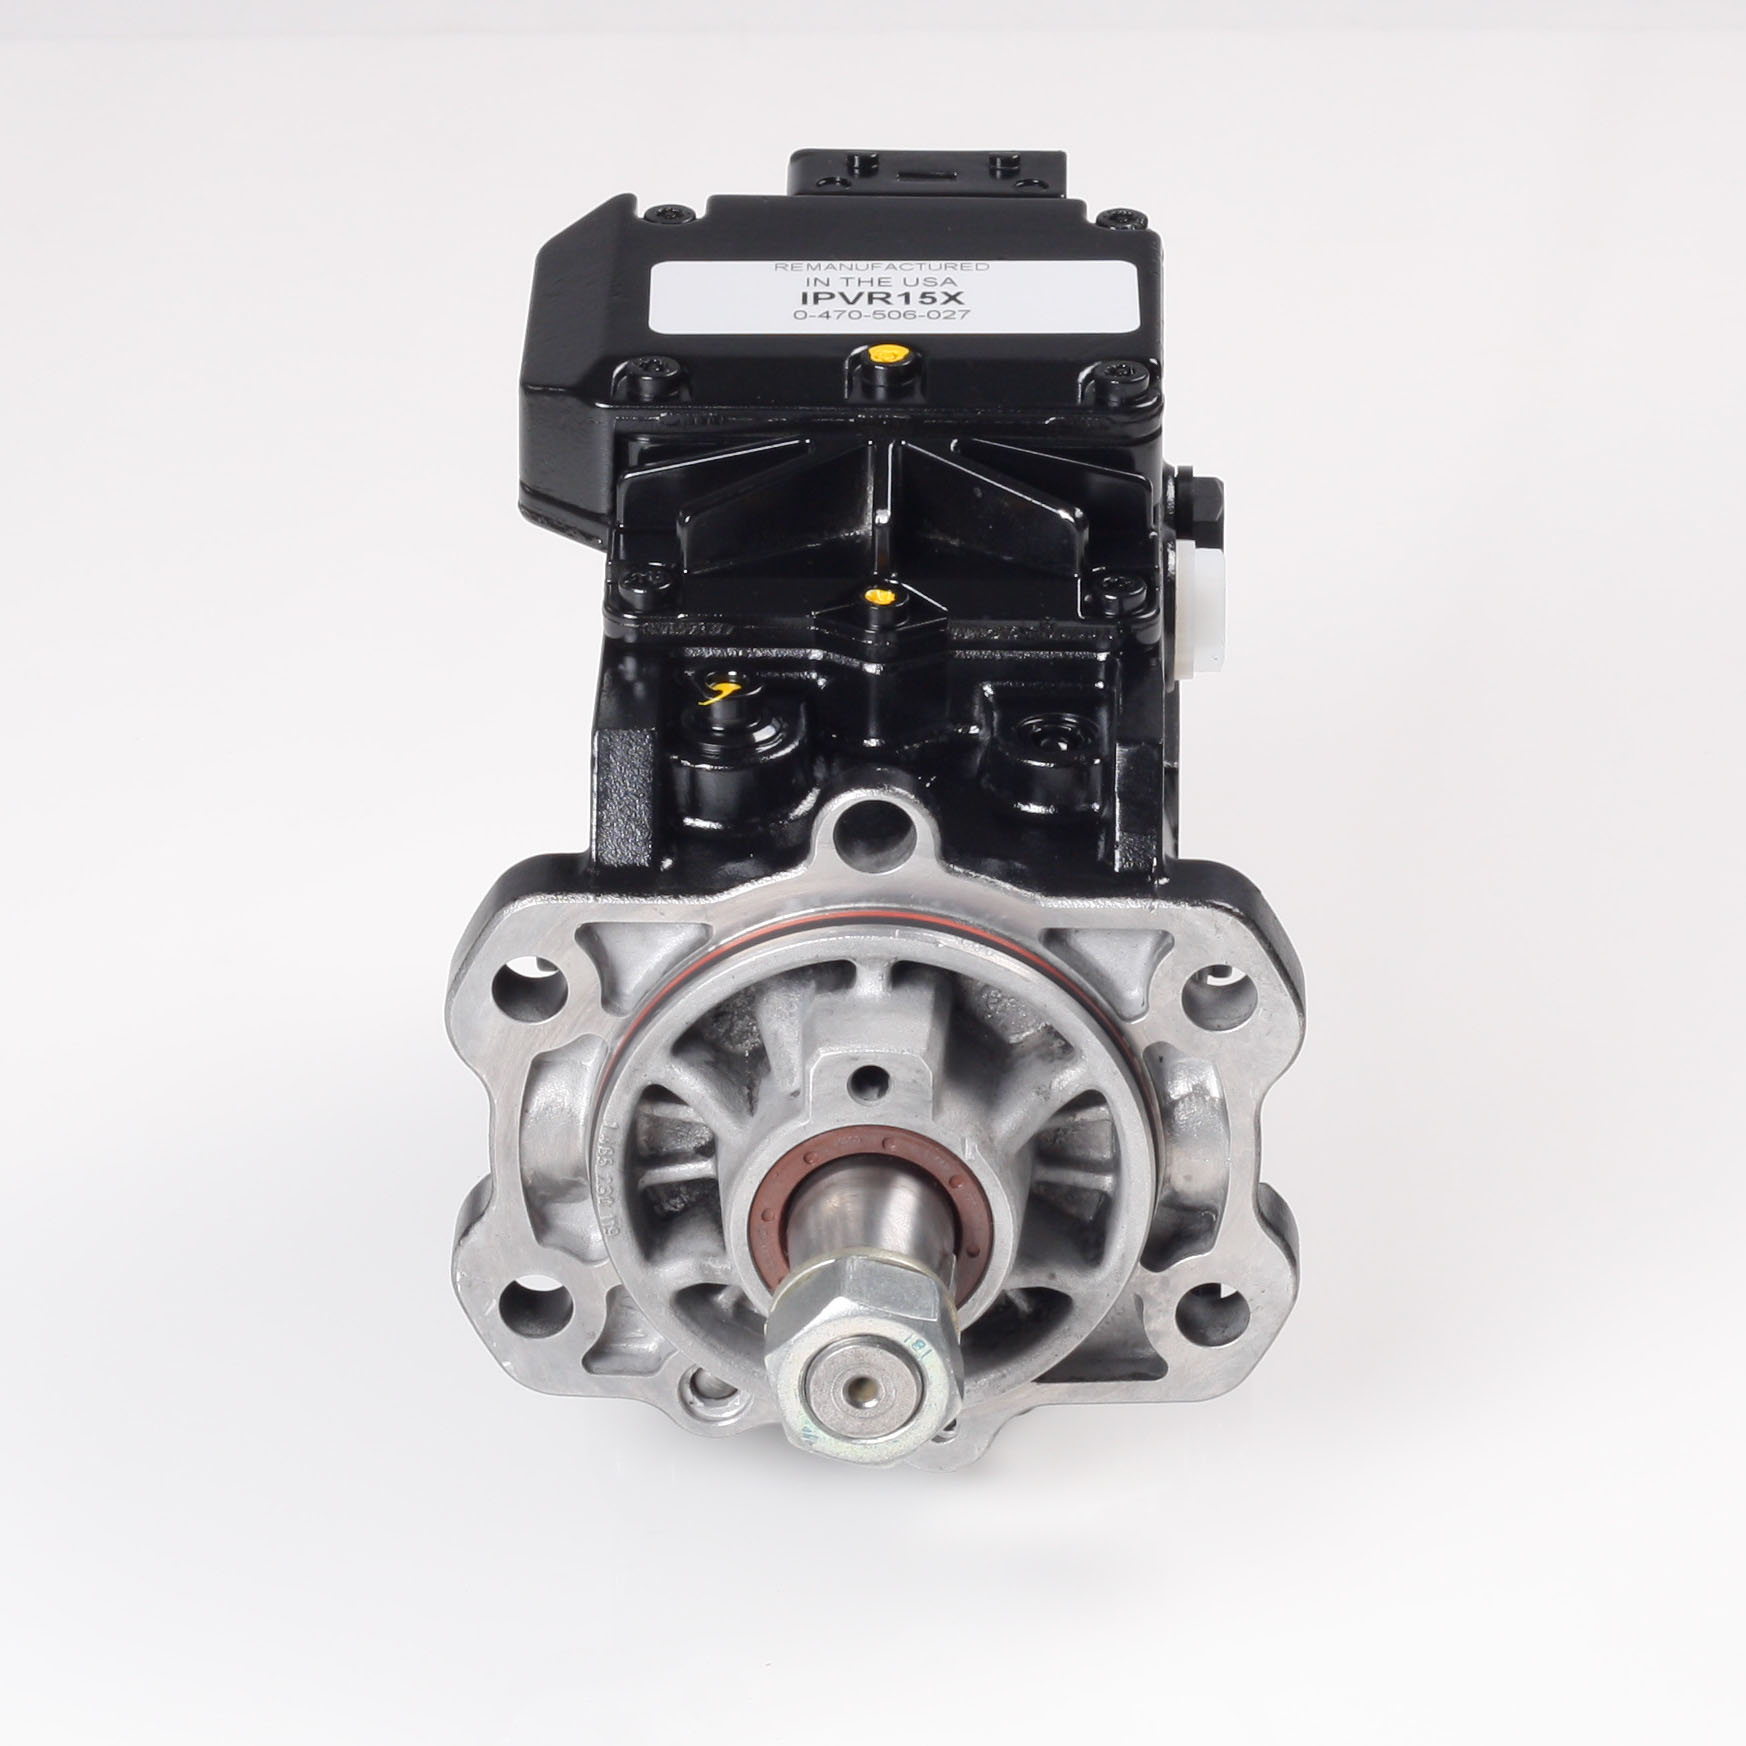 Dodge 59l 17x Vp44 Pump 245hp Remanufactured Fuel Mid Range Cummins Isb Injection